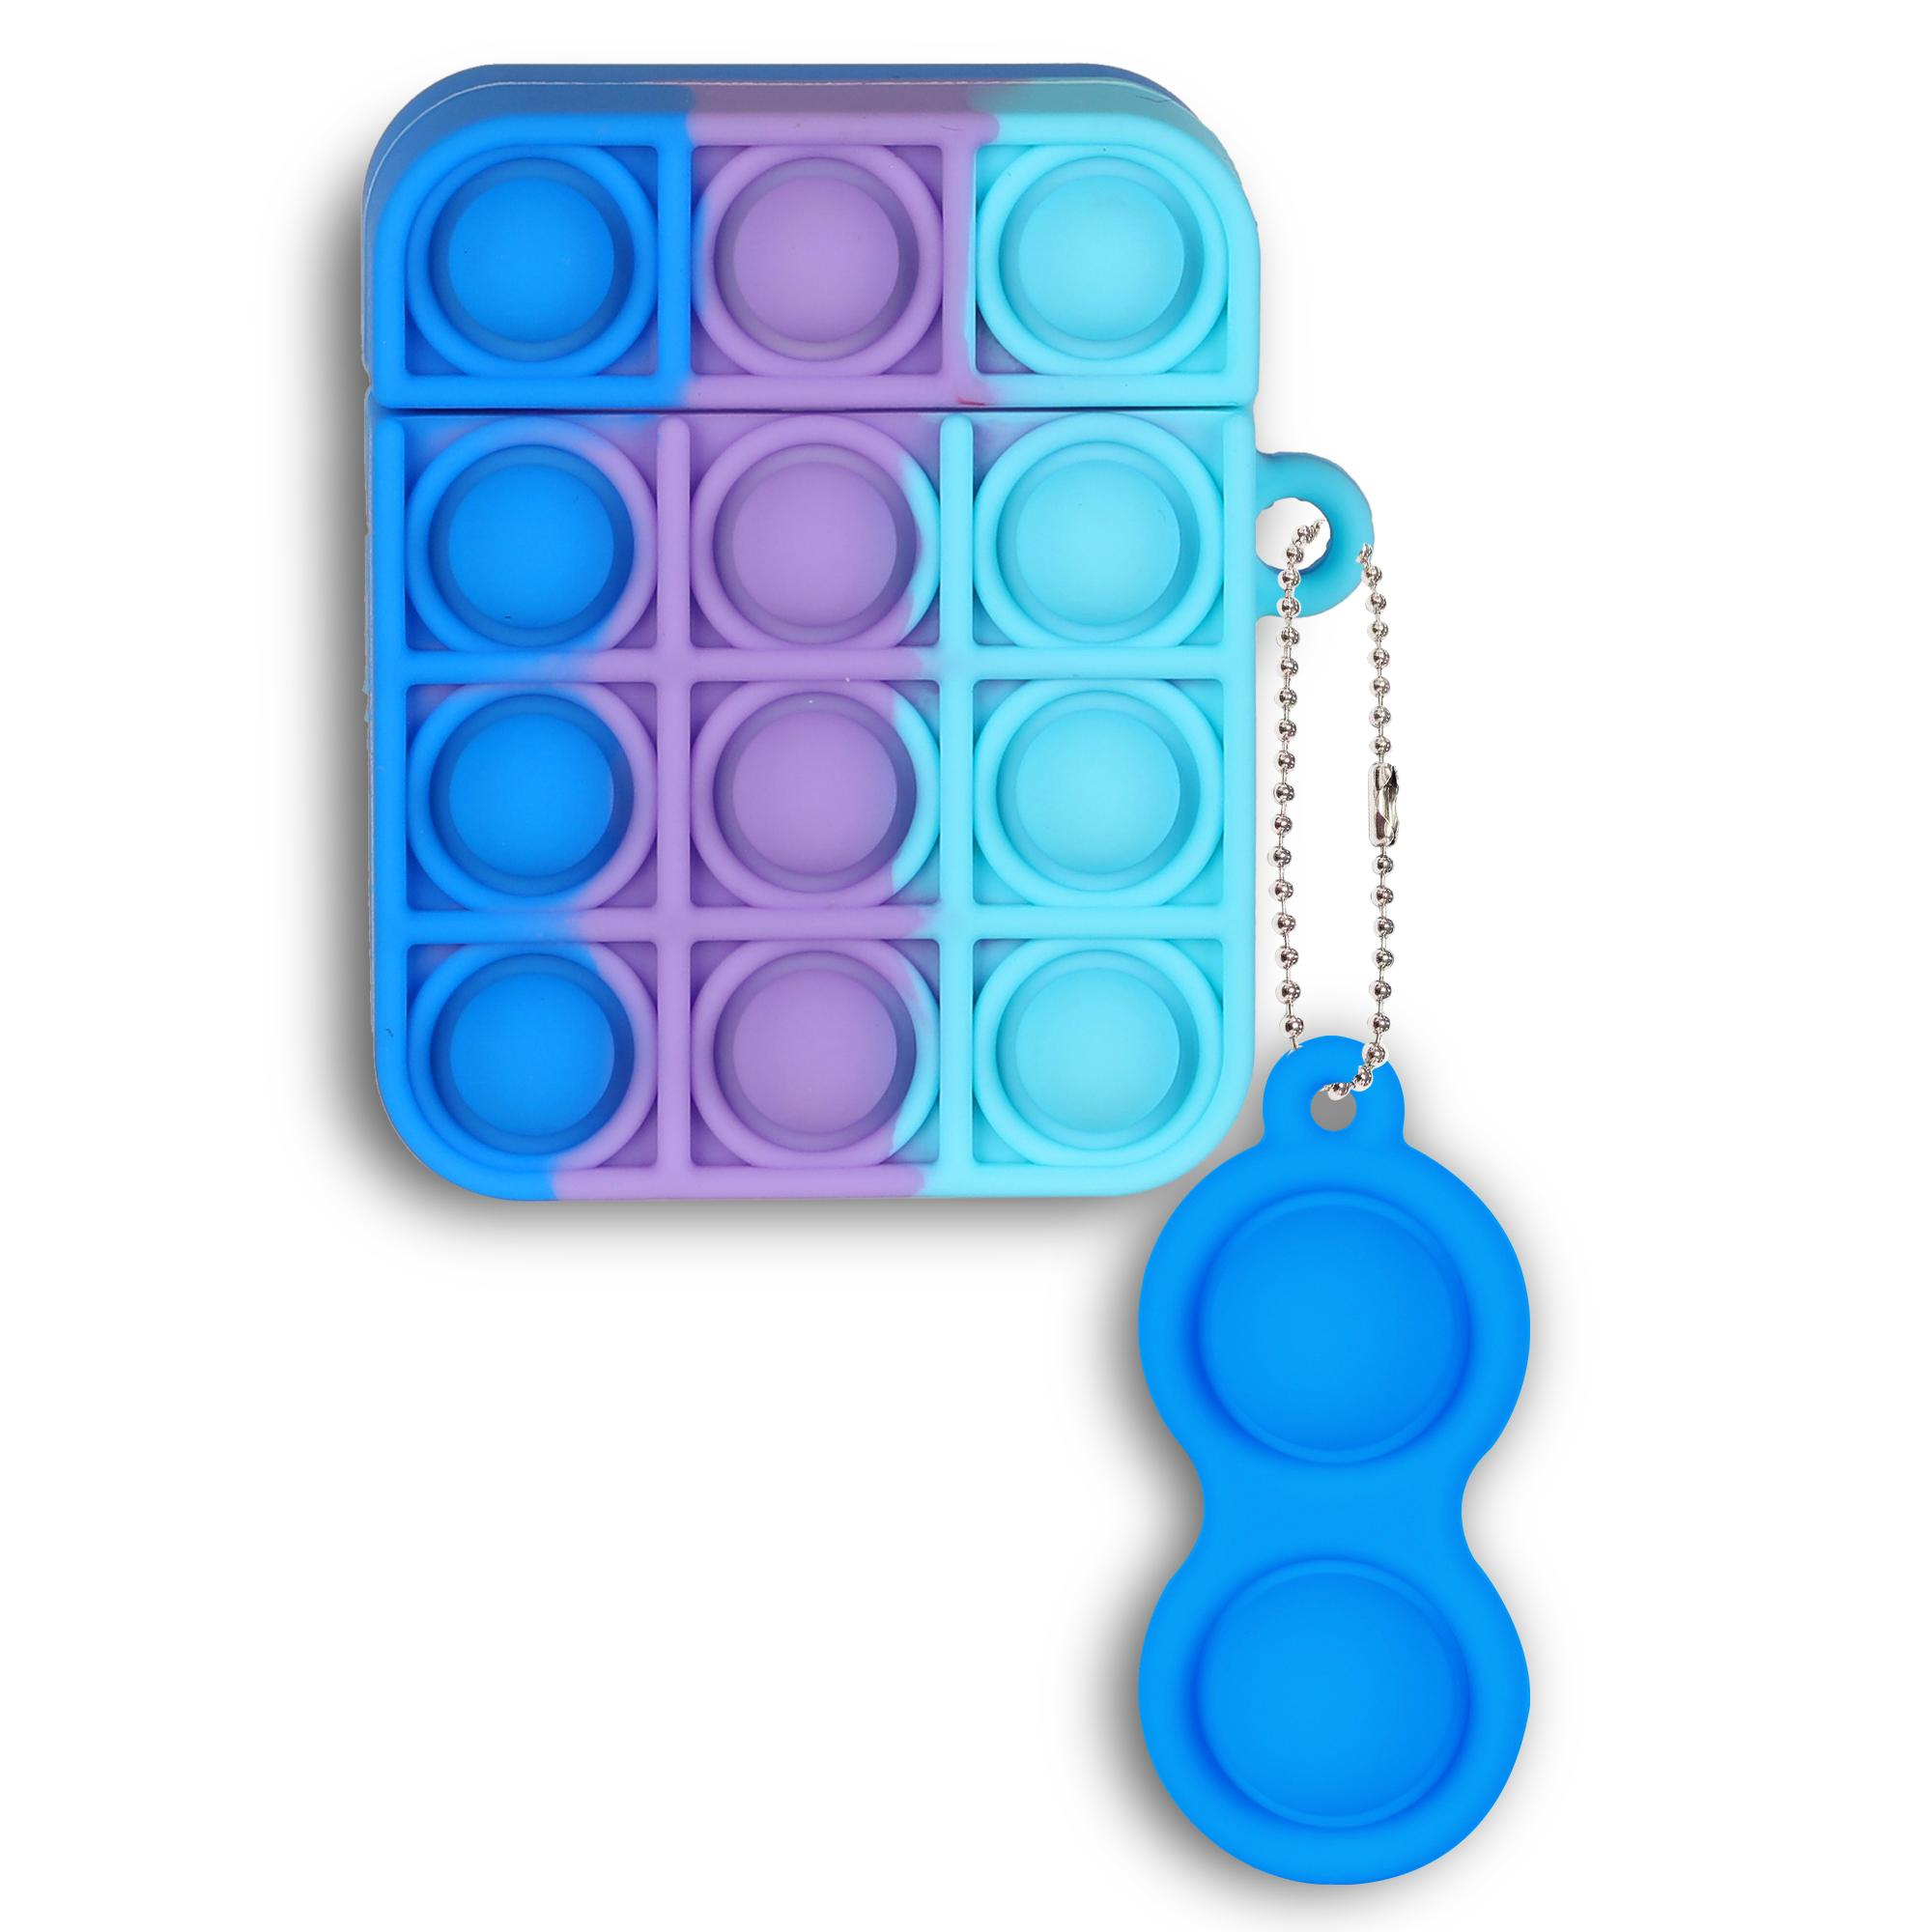 Rainbow Relive Tess Pop Fidget Toys PUSH IT BUBBLE CASOS DE PROTECTORES PARA AIRPODS PRO 1 2 SILICONA DE DECOMPRESIÓN 200PCS / LOT